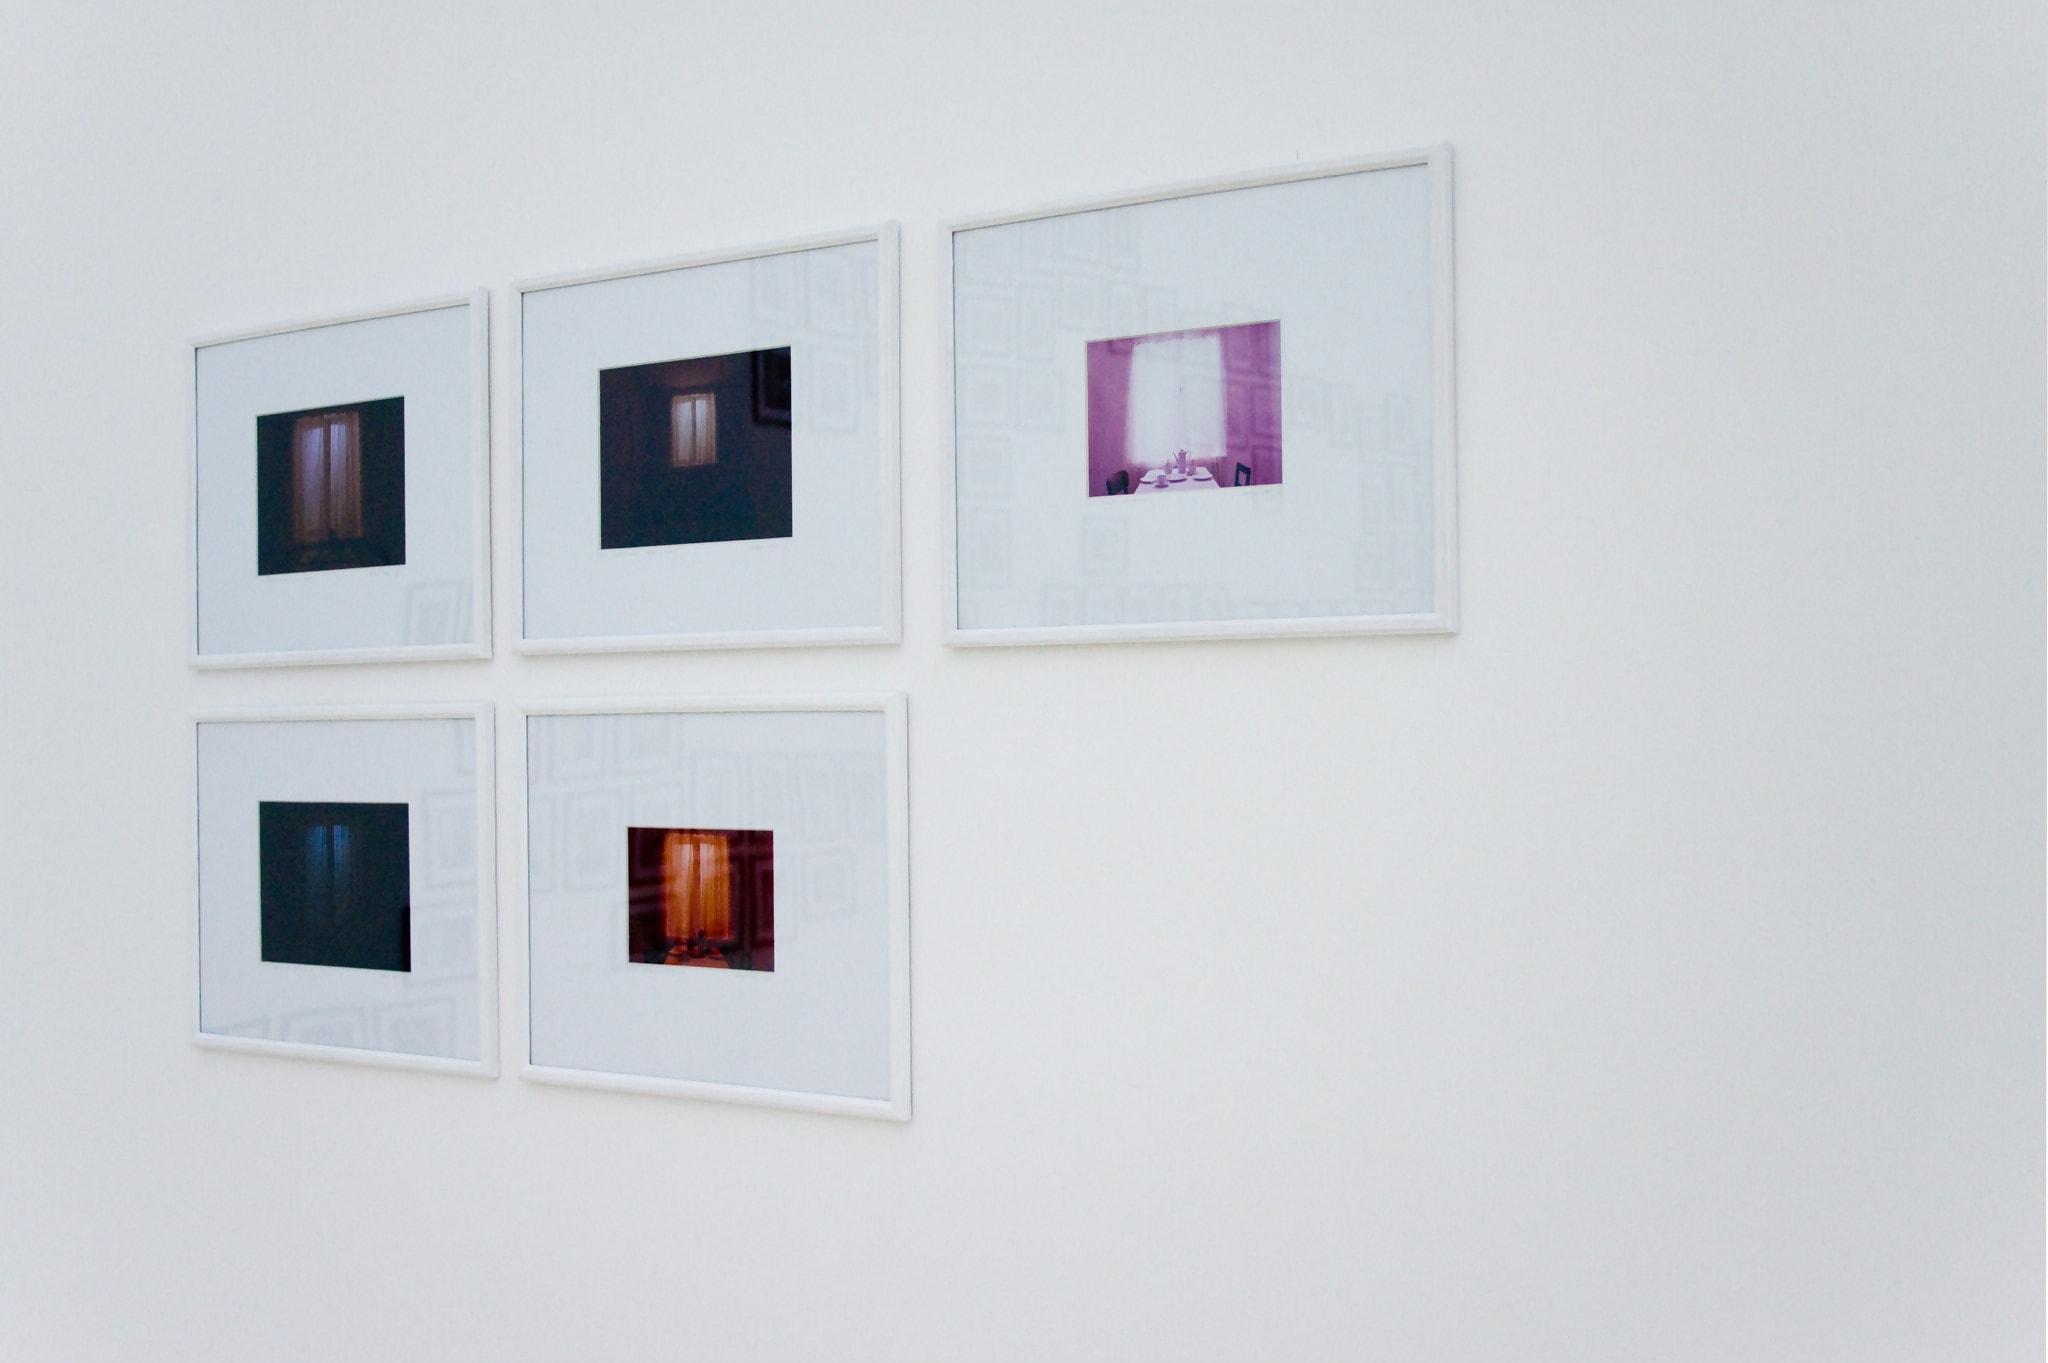 u r 10 Kaffeezimmer (Farbe) by Gregor Schneider